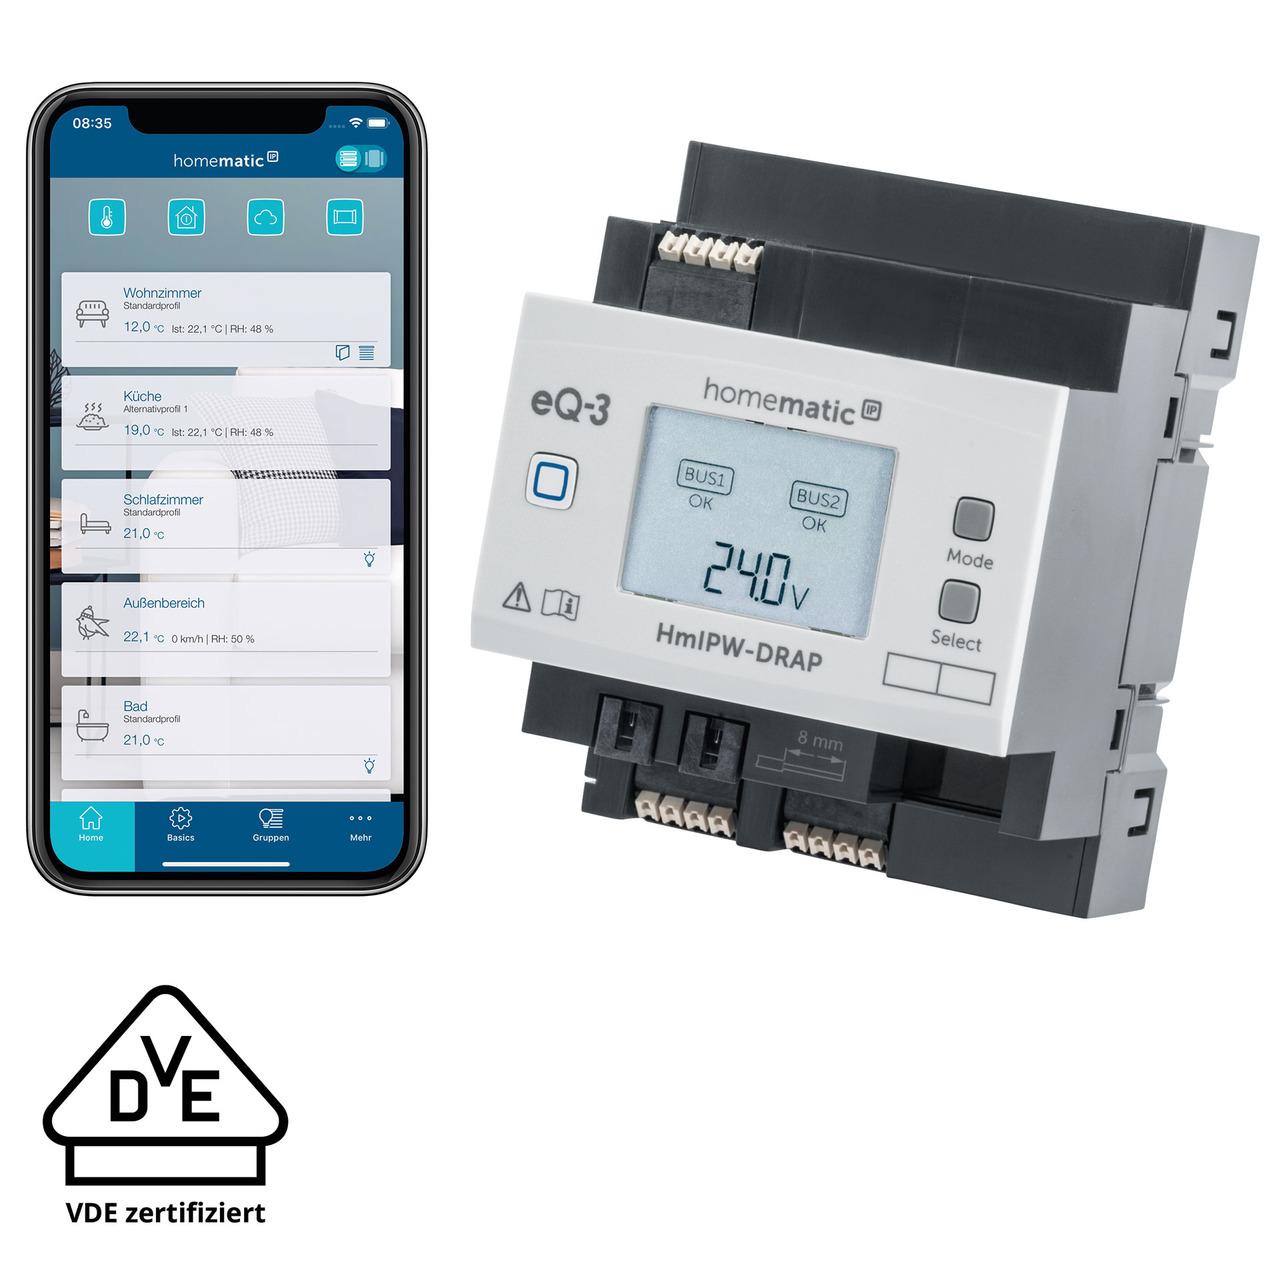 Homematic IP Wired Access Point HmIPW-DRAP- VDE zertifiziert